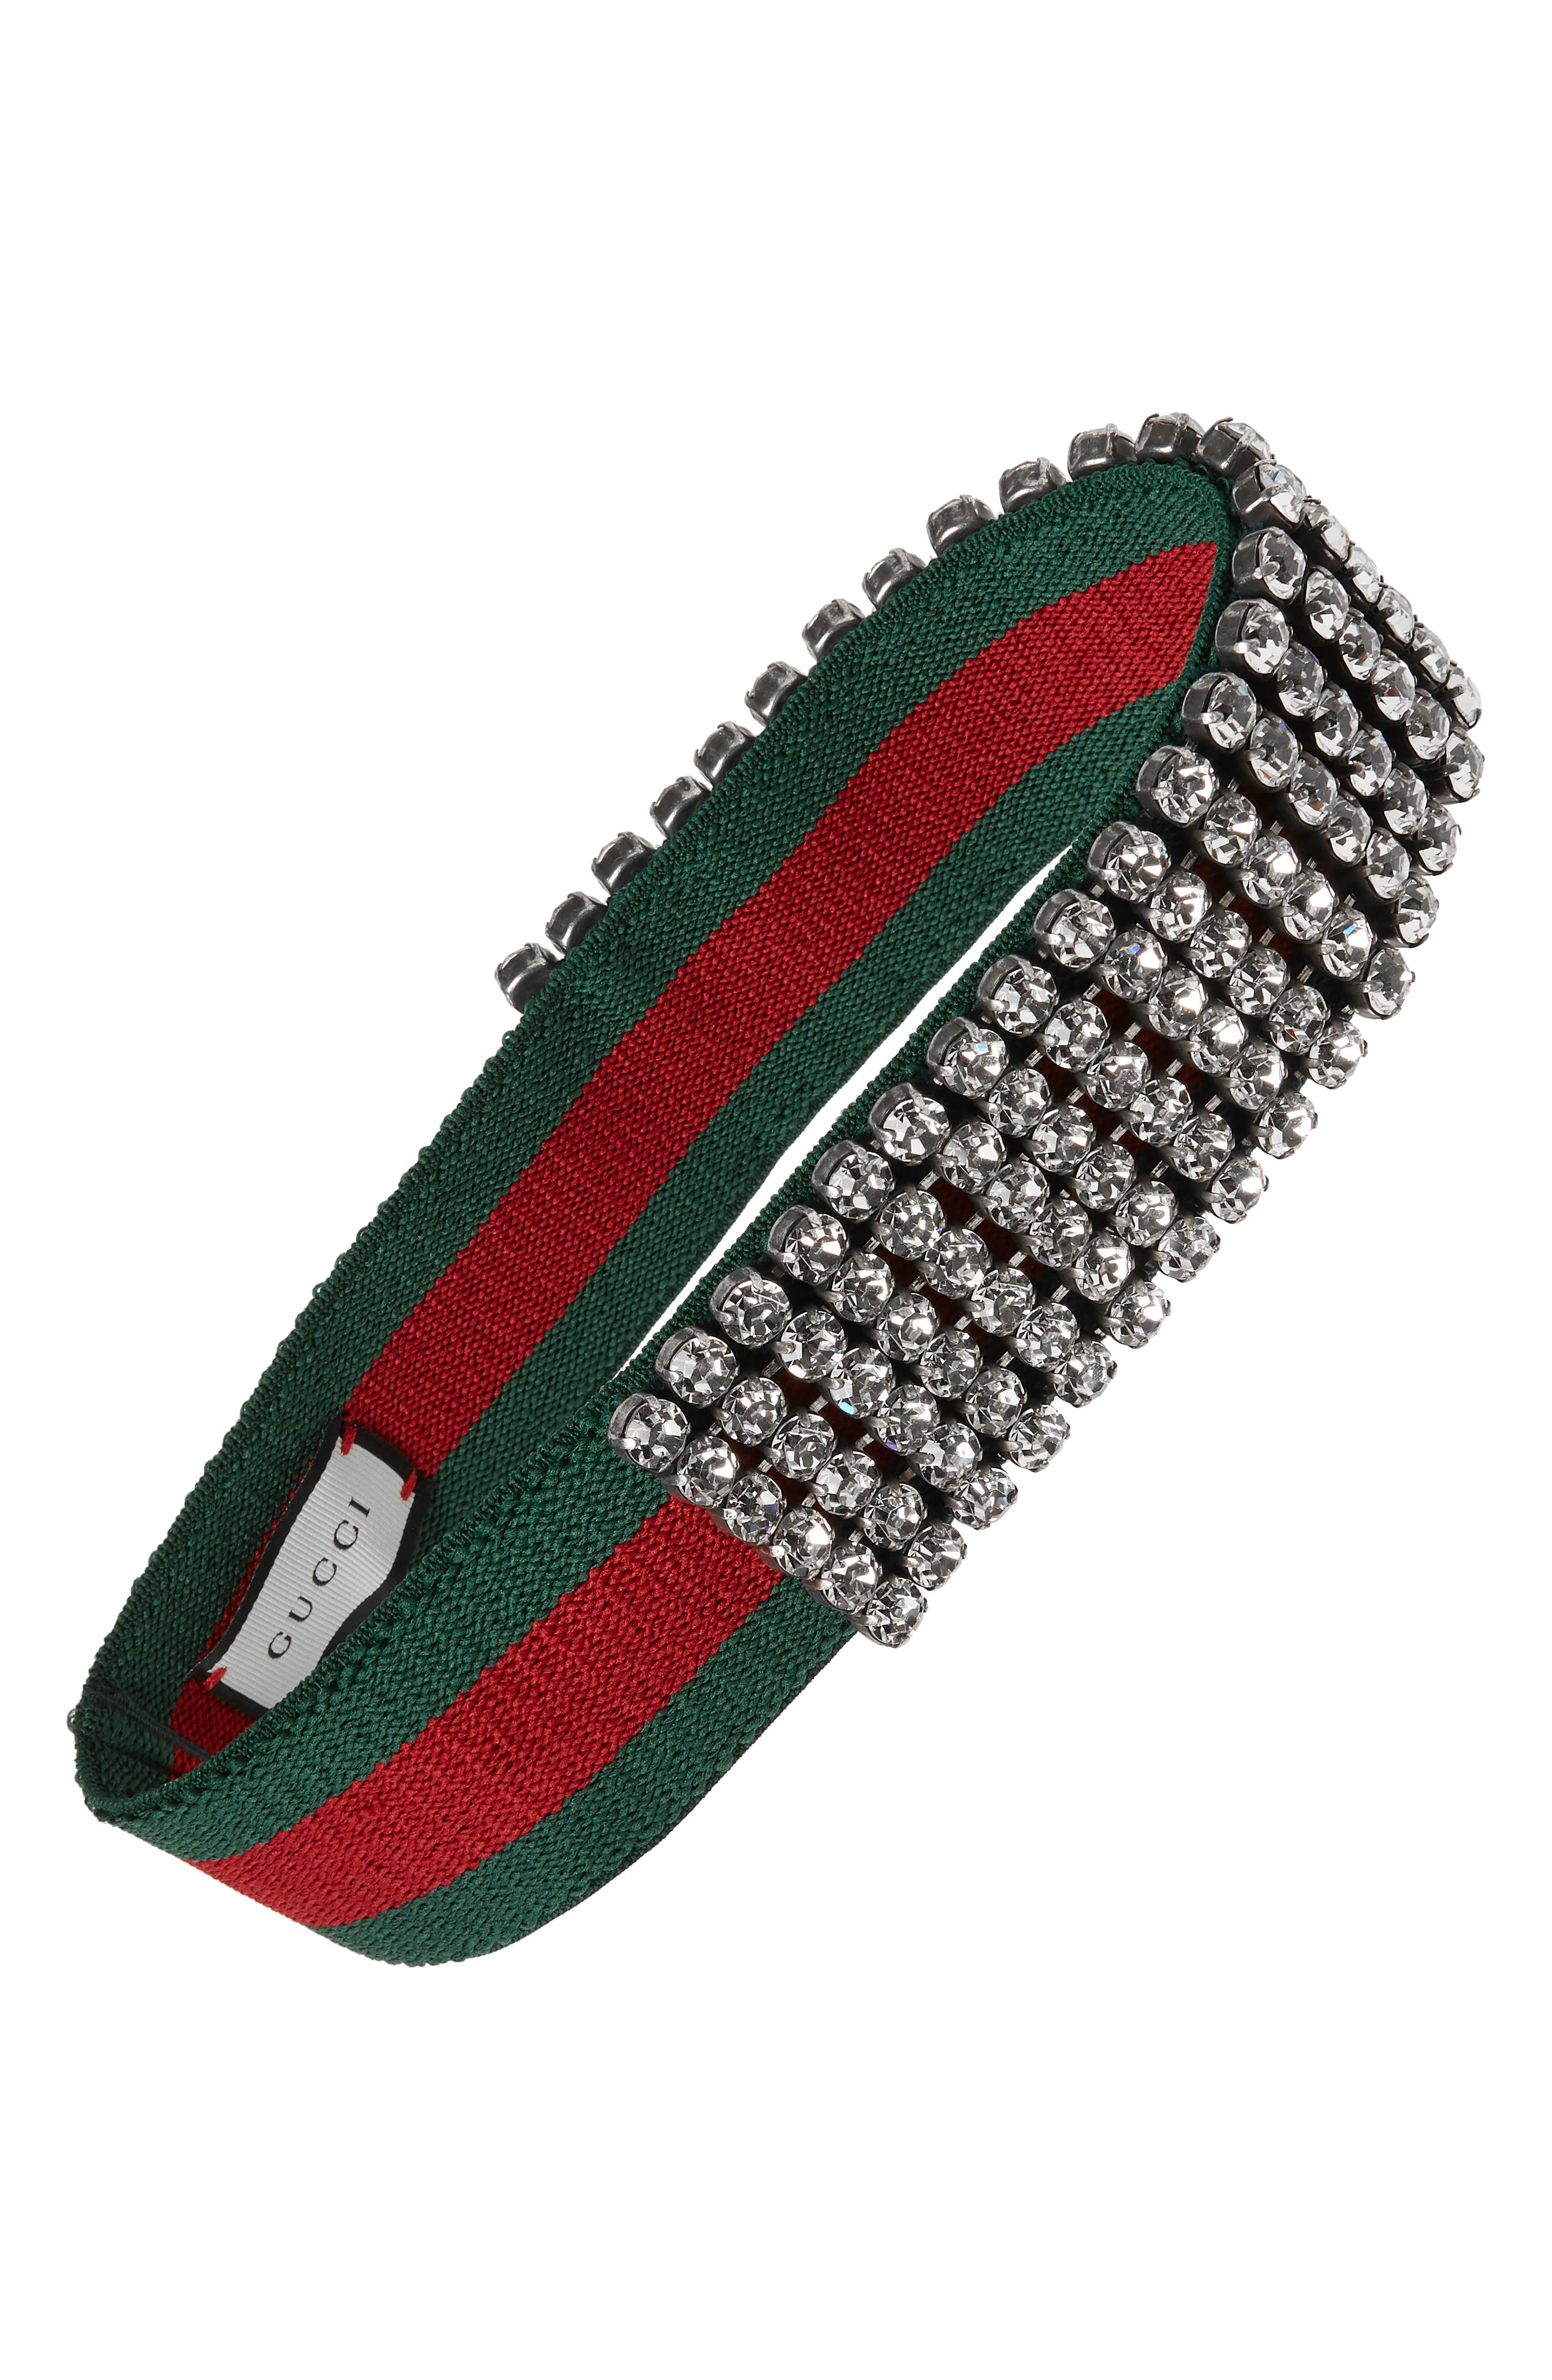 Webby Crystal Headband,                             Main thumbnail 1, color,                             DARK GREEN BOTTLE/ RED